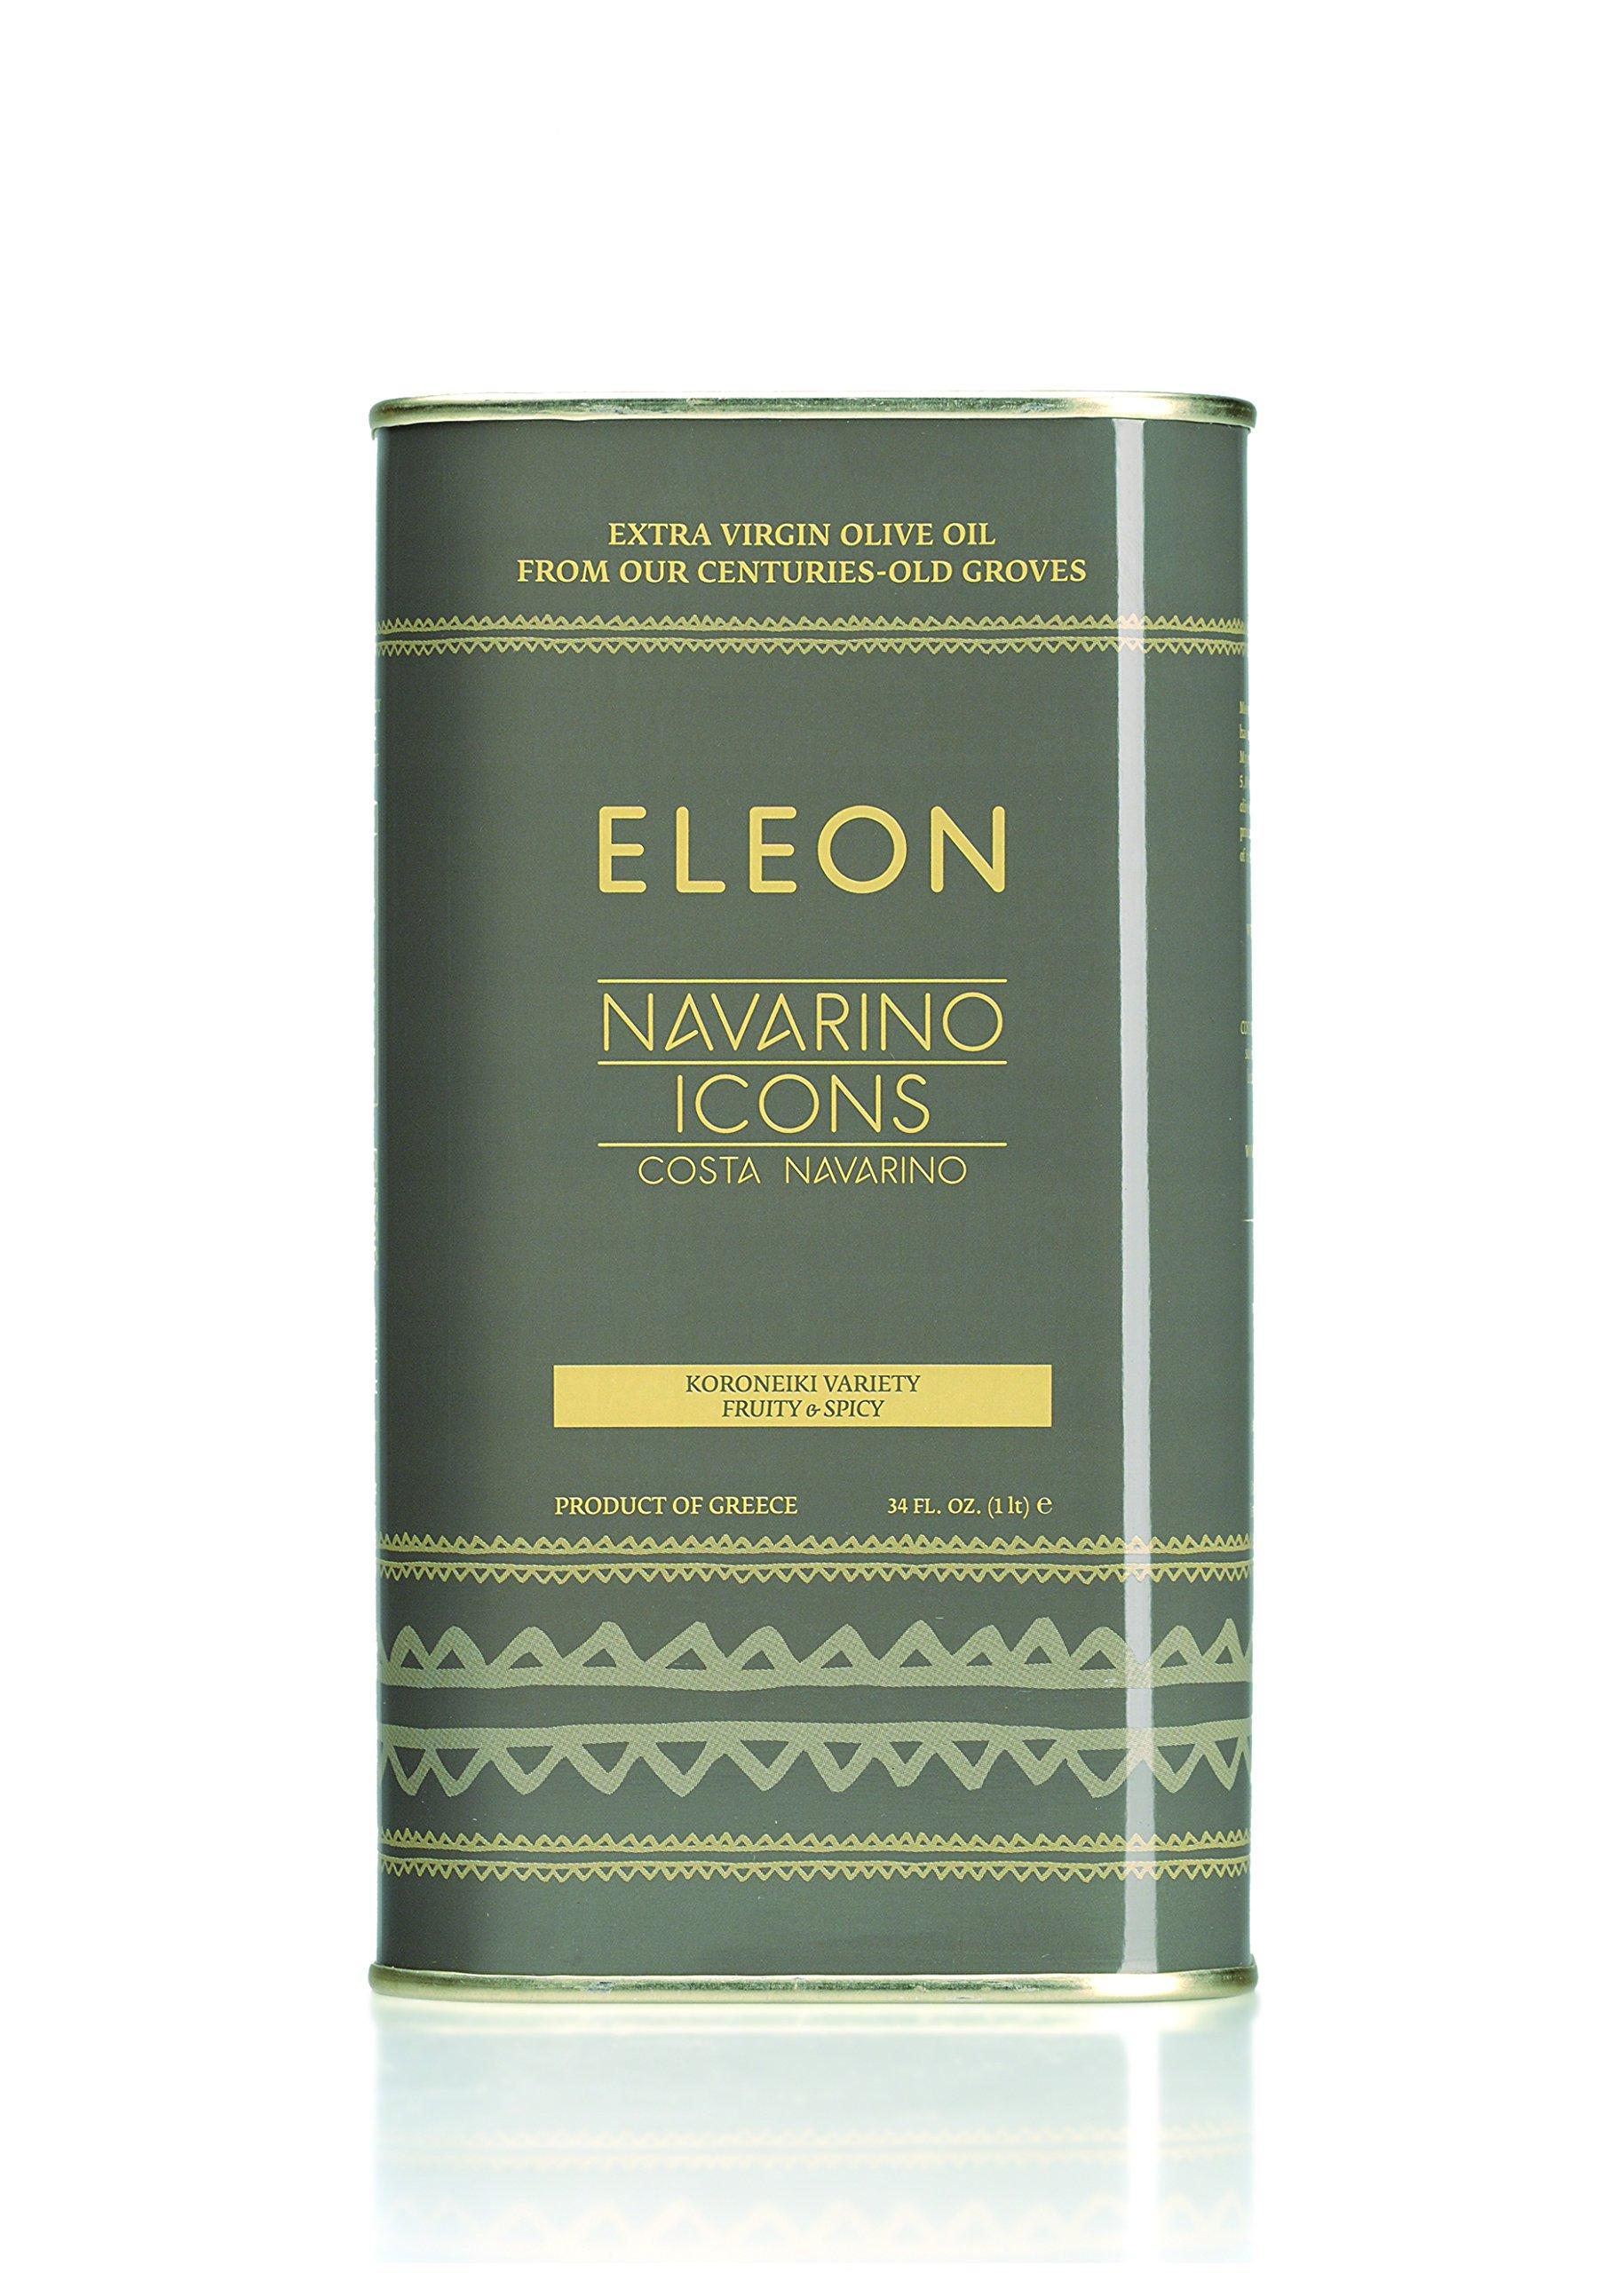 NAVARINO ICONS Eleon Greek Estate Extra Virgin Olive Oil, Fruit & Spicy,  34 Fluid Ounce